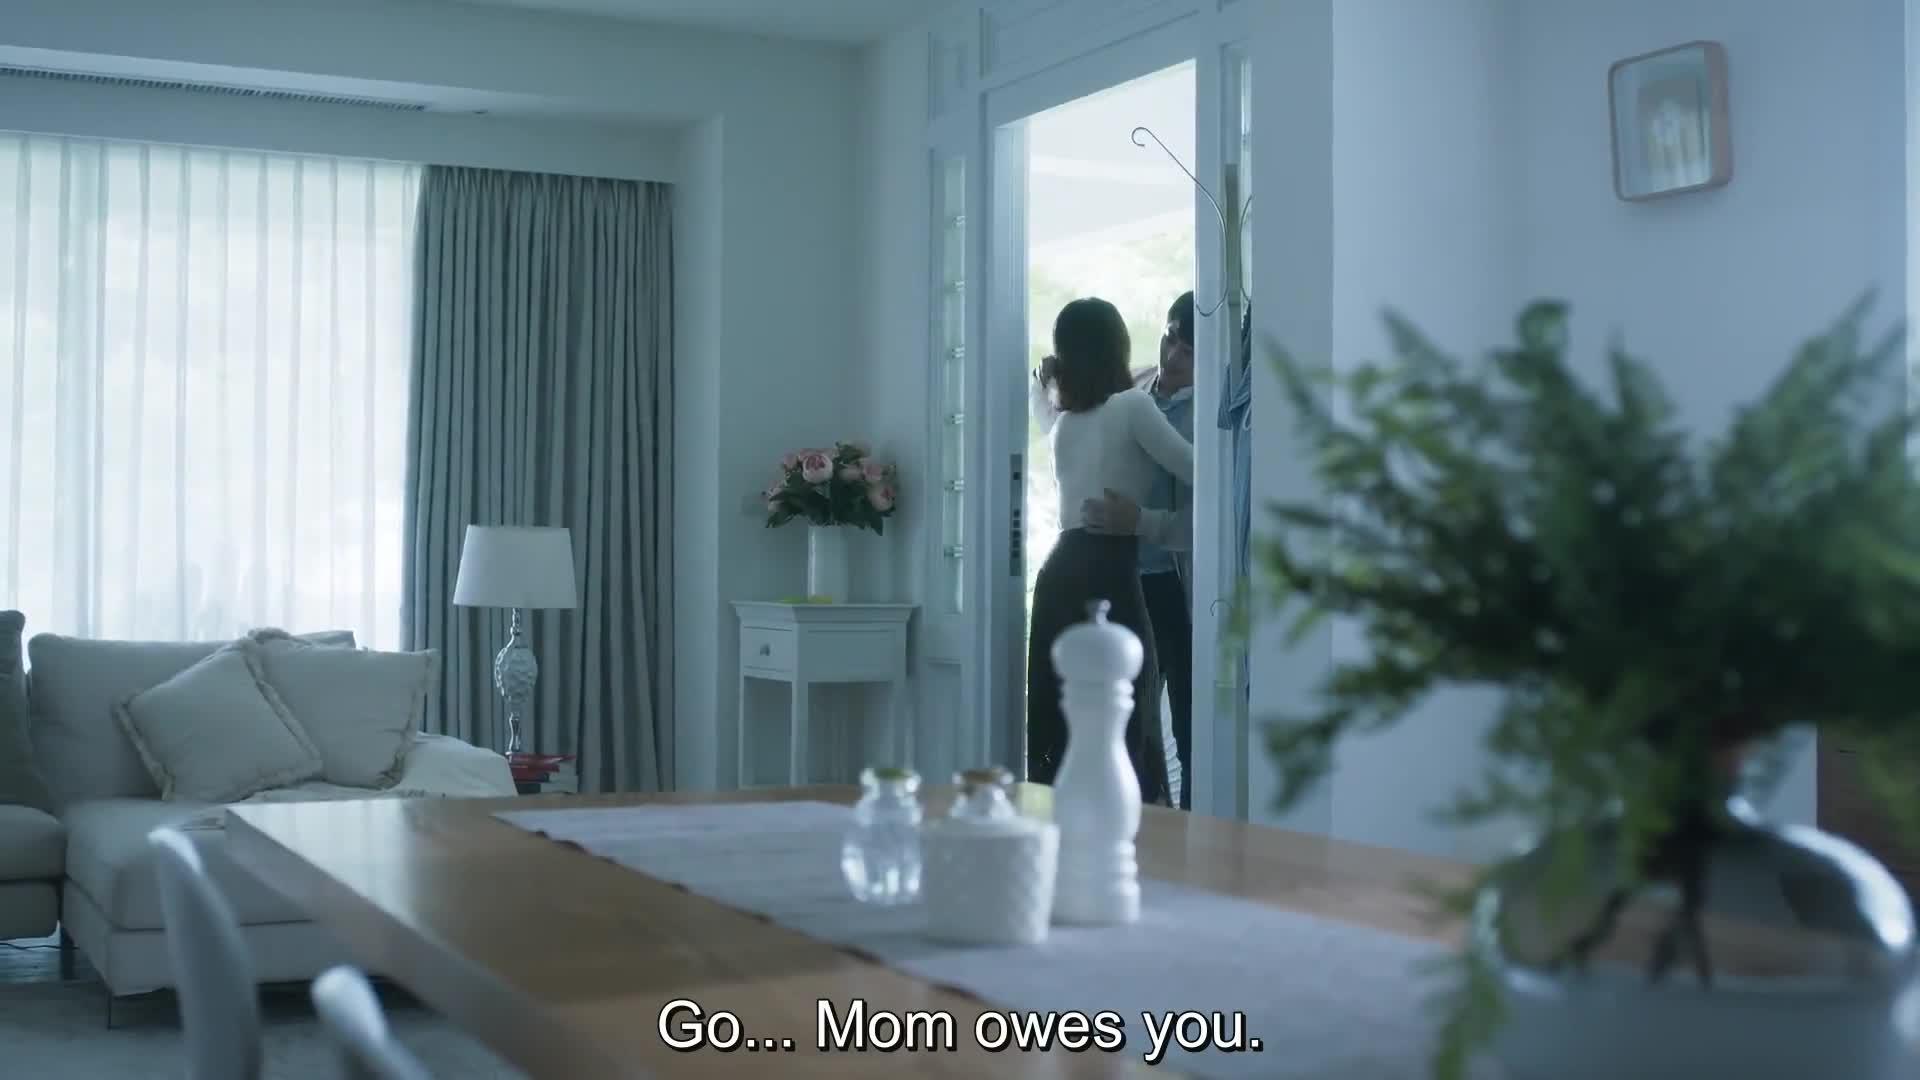 We Best Love: Fighting Mr. 2nd (2021)